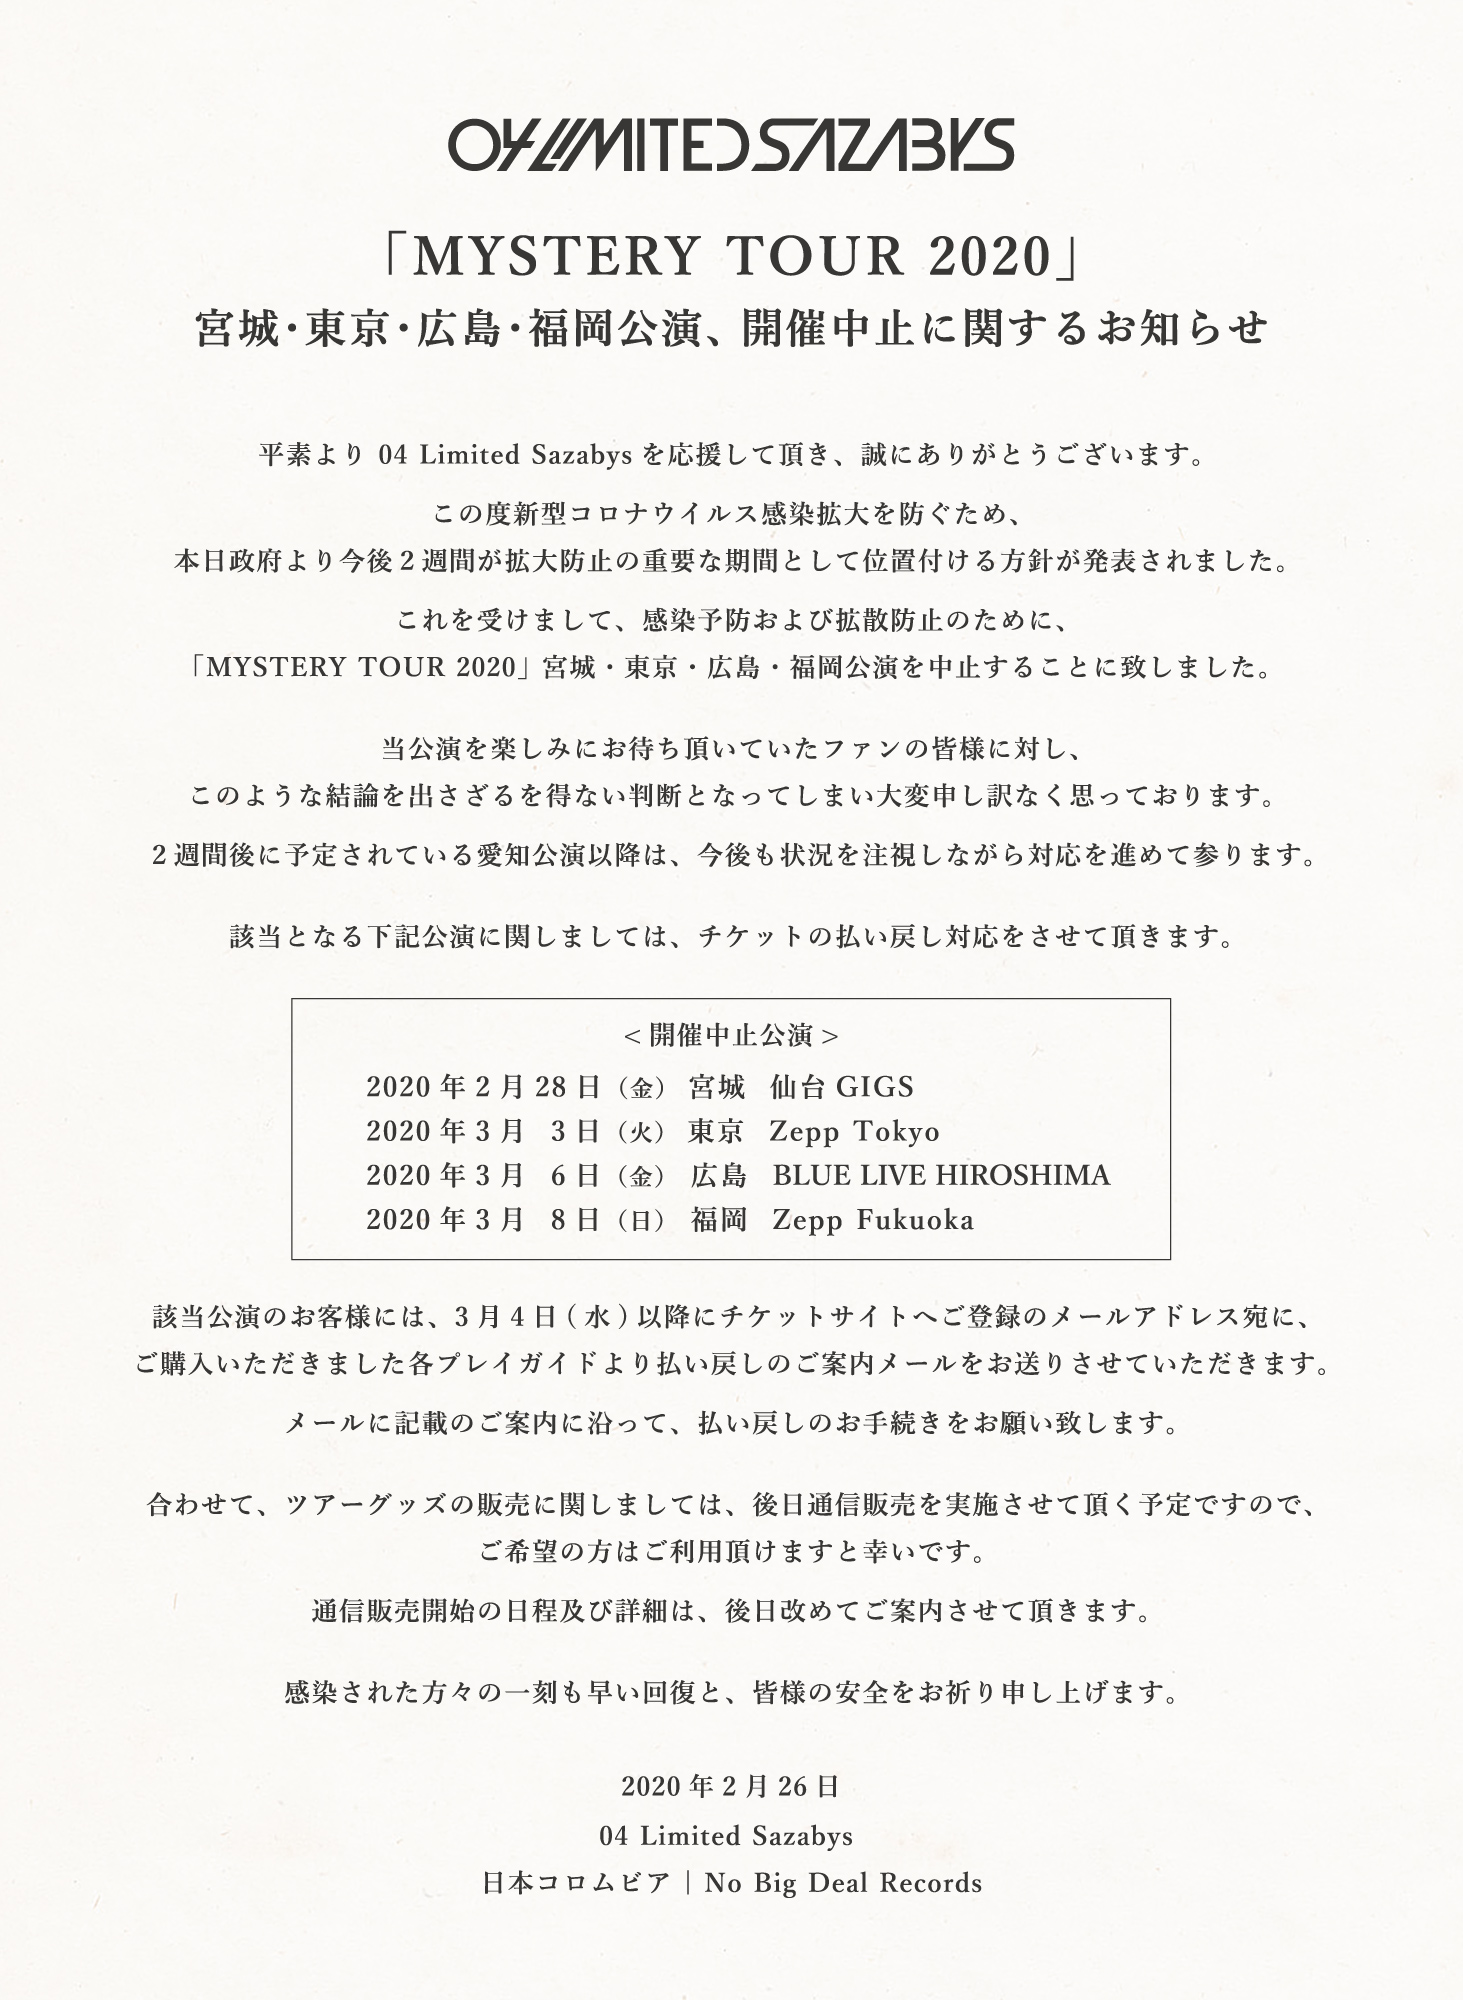 「MYSTERY TOUR 2020」宮城・東京・広島・福岡公演、開催中止に関するお知らせ